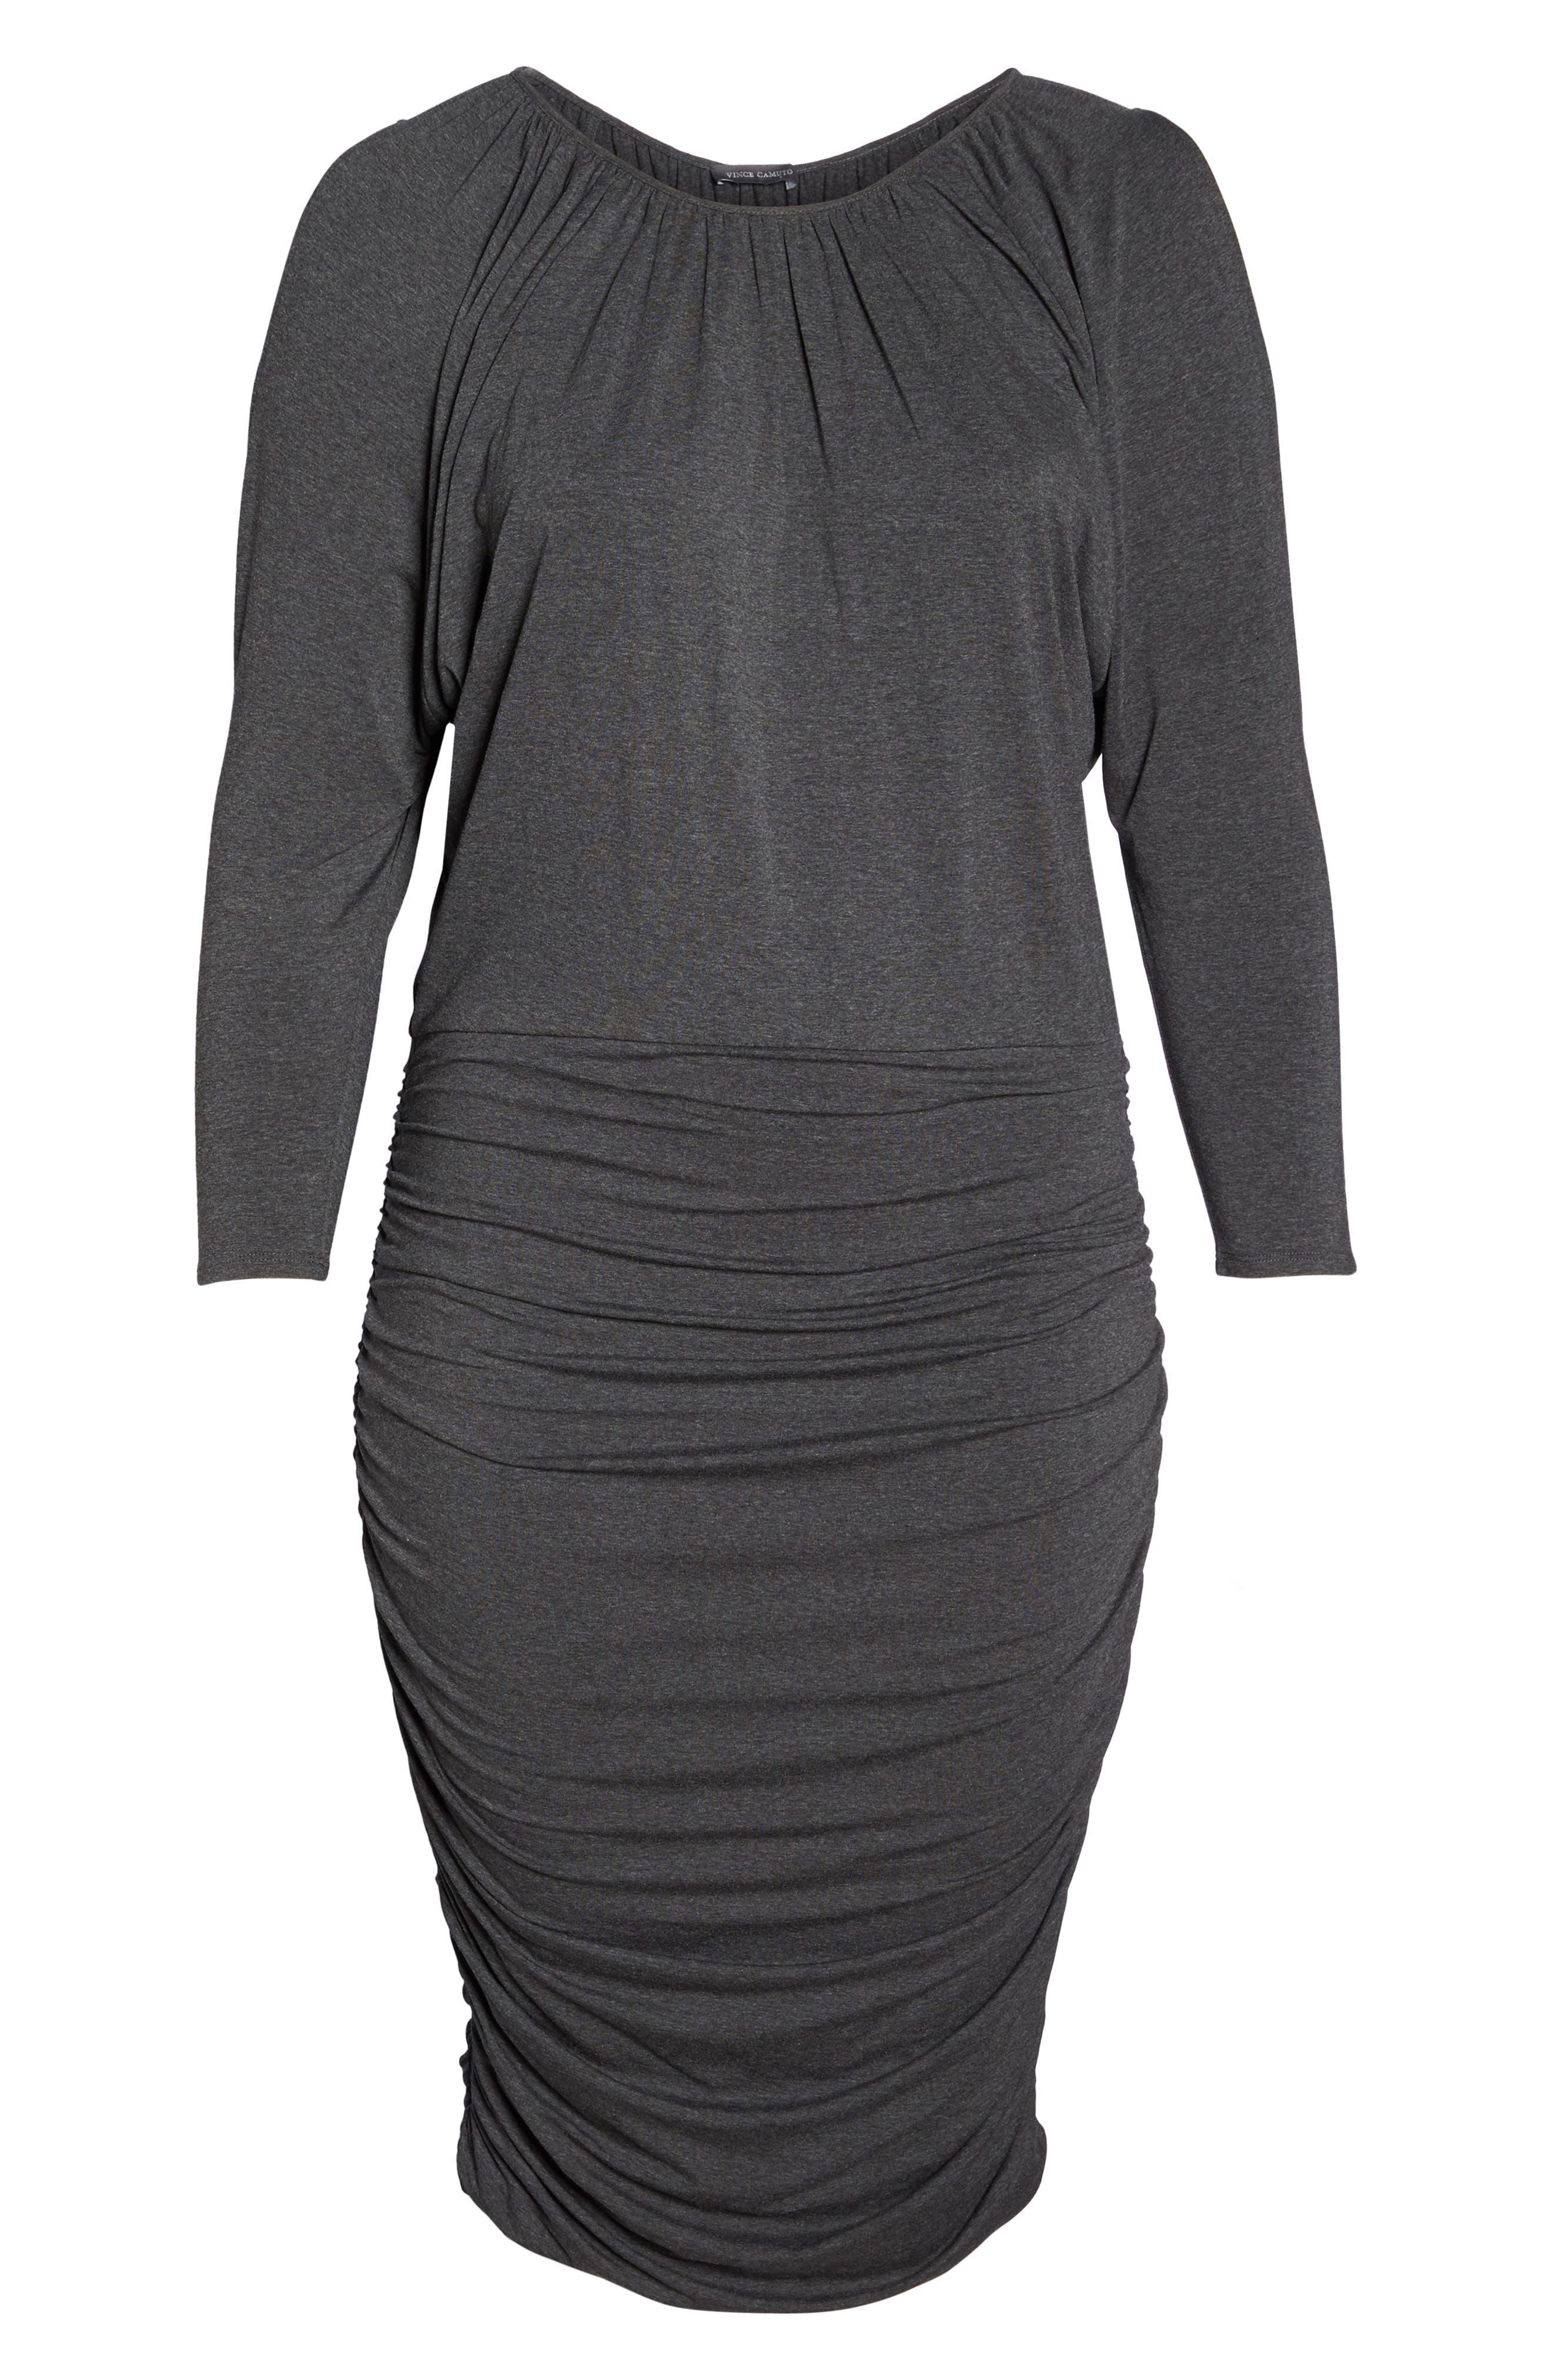 Slit Sleeve Knit Sheath Dress,                             Alternate thumbnail 6, color,                             Medium Heather Grey